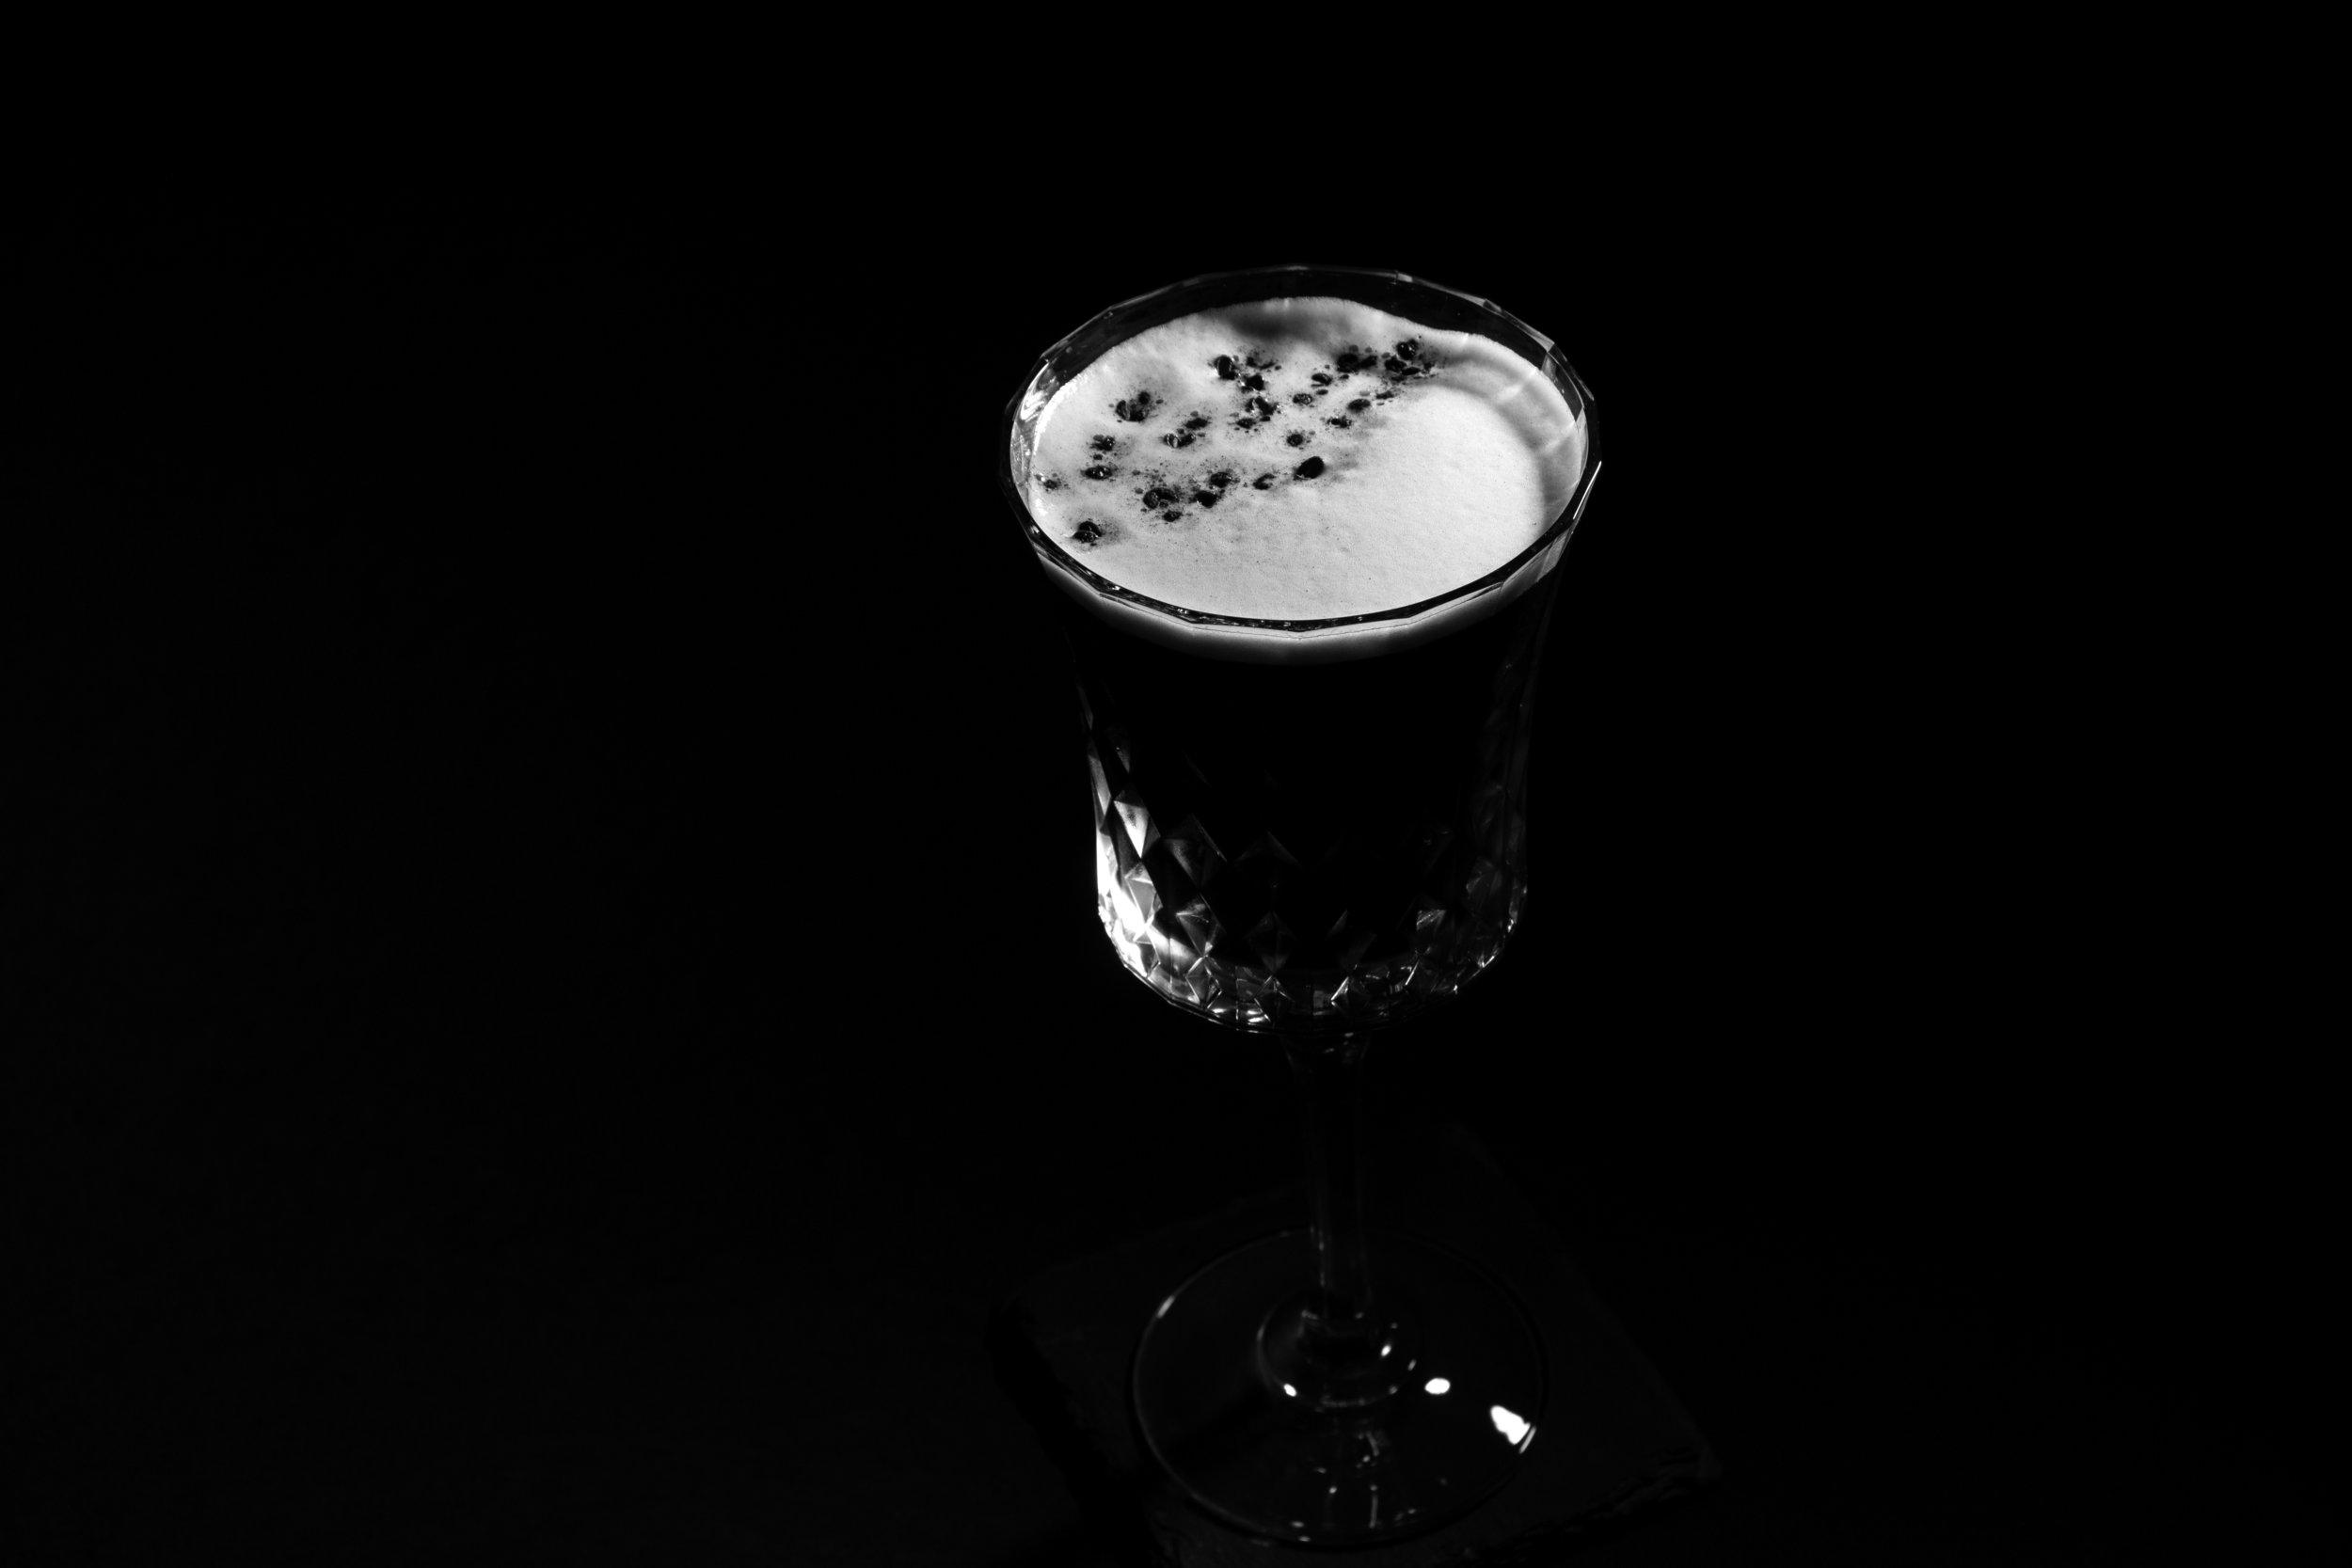 B.A.M - BLACK MIXOLOGIE